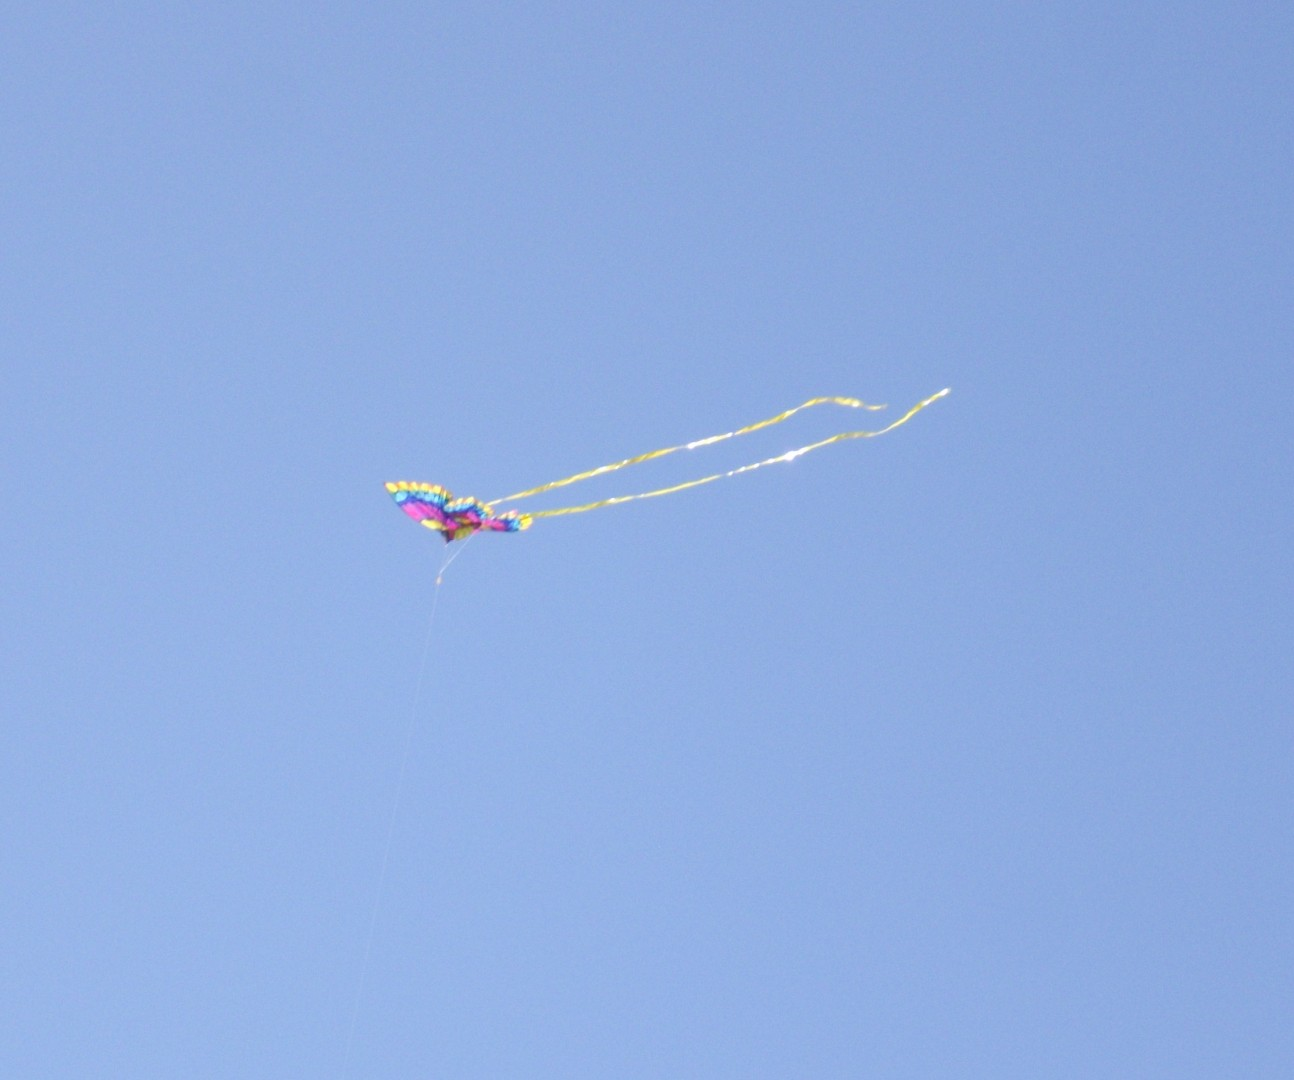 Kite Flying 2010 Festival | Joyce Kuzmanic